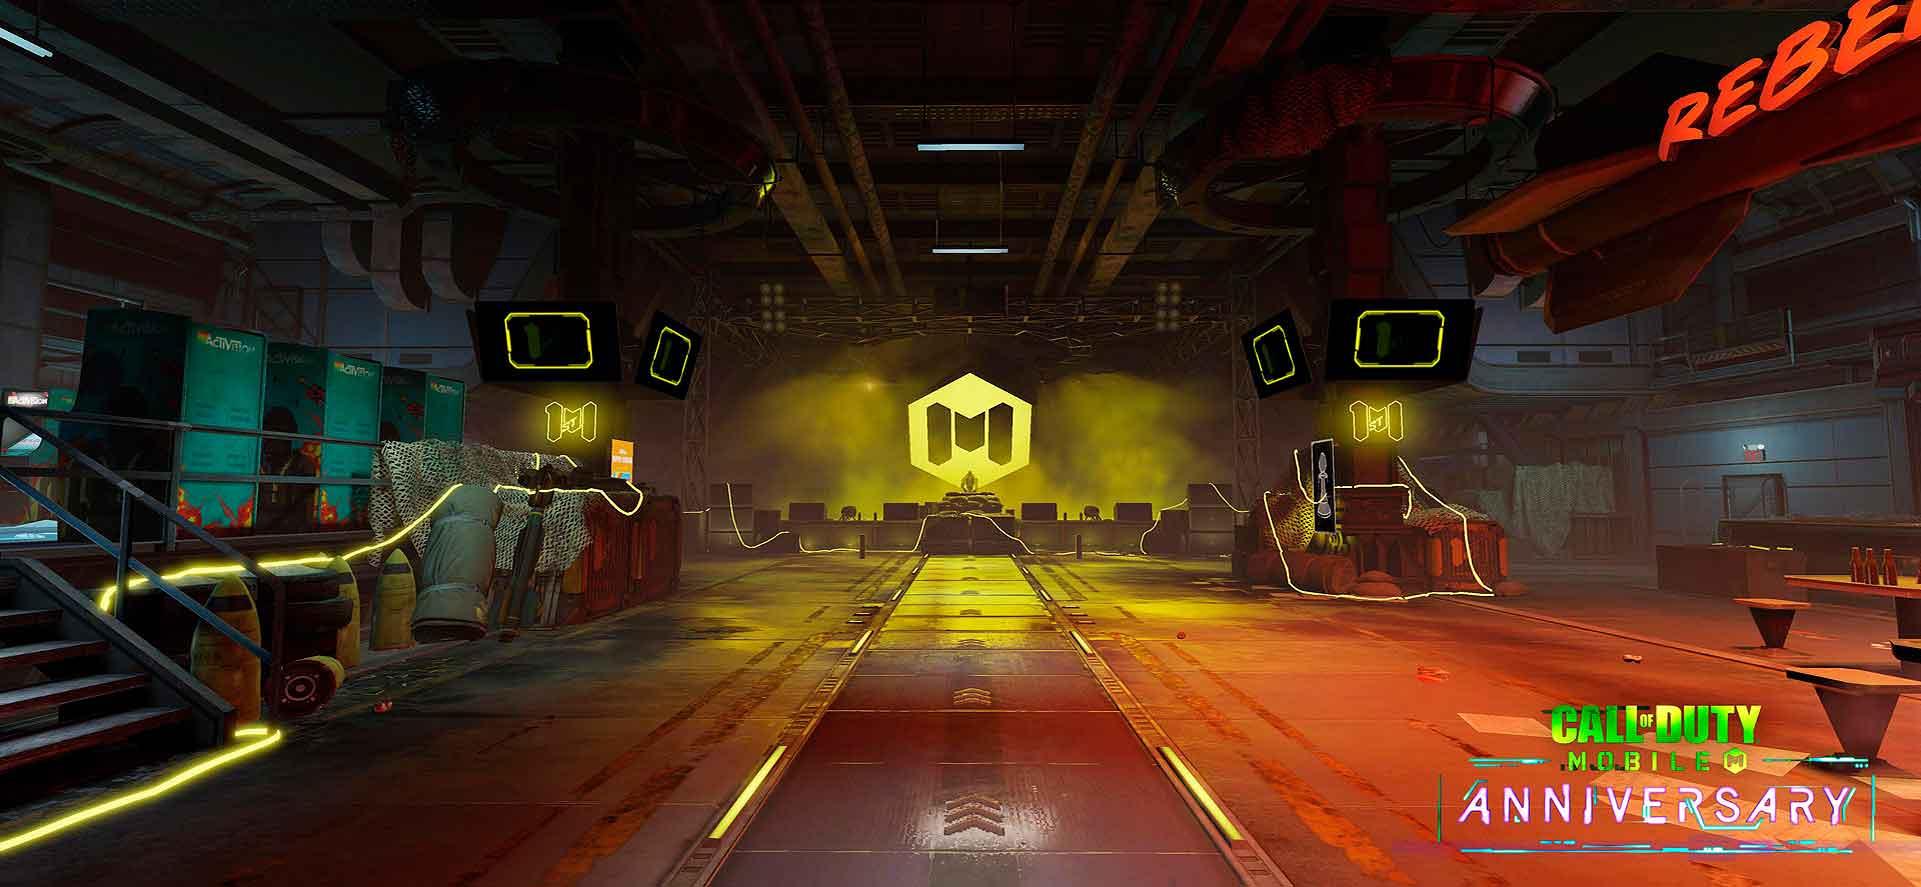 Секреты в клубе Call of Duty: Mobile